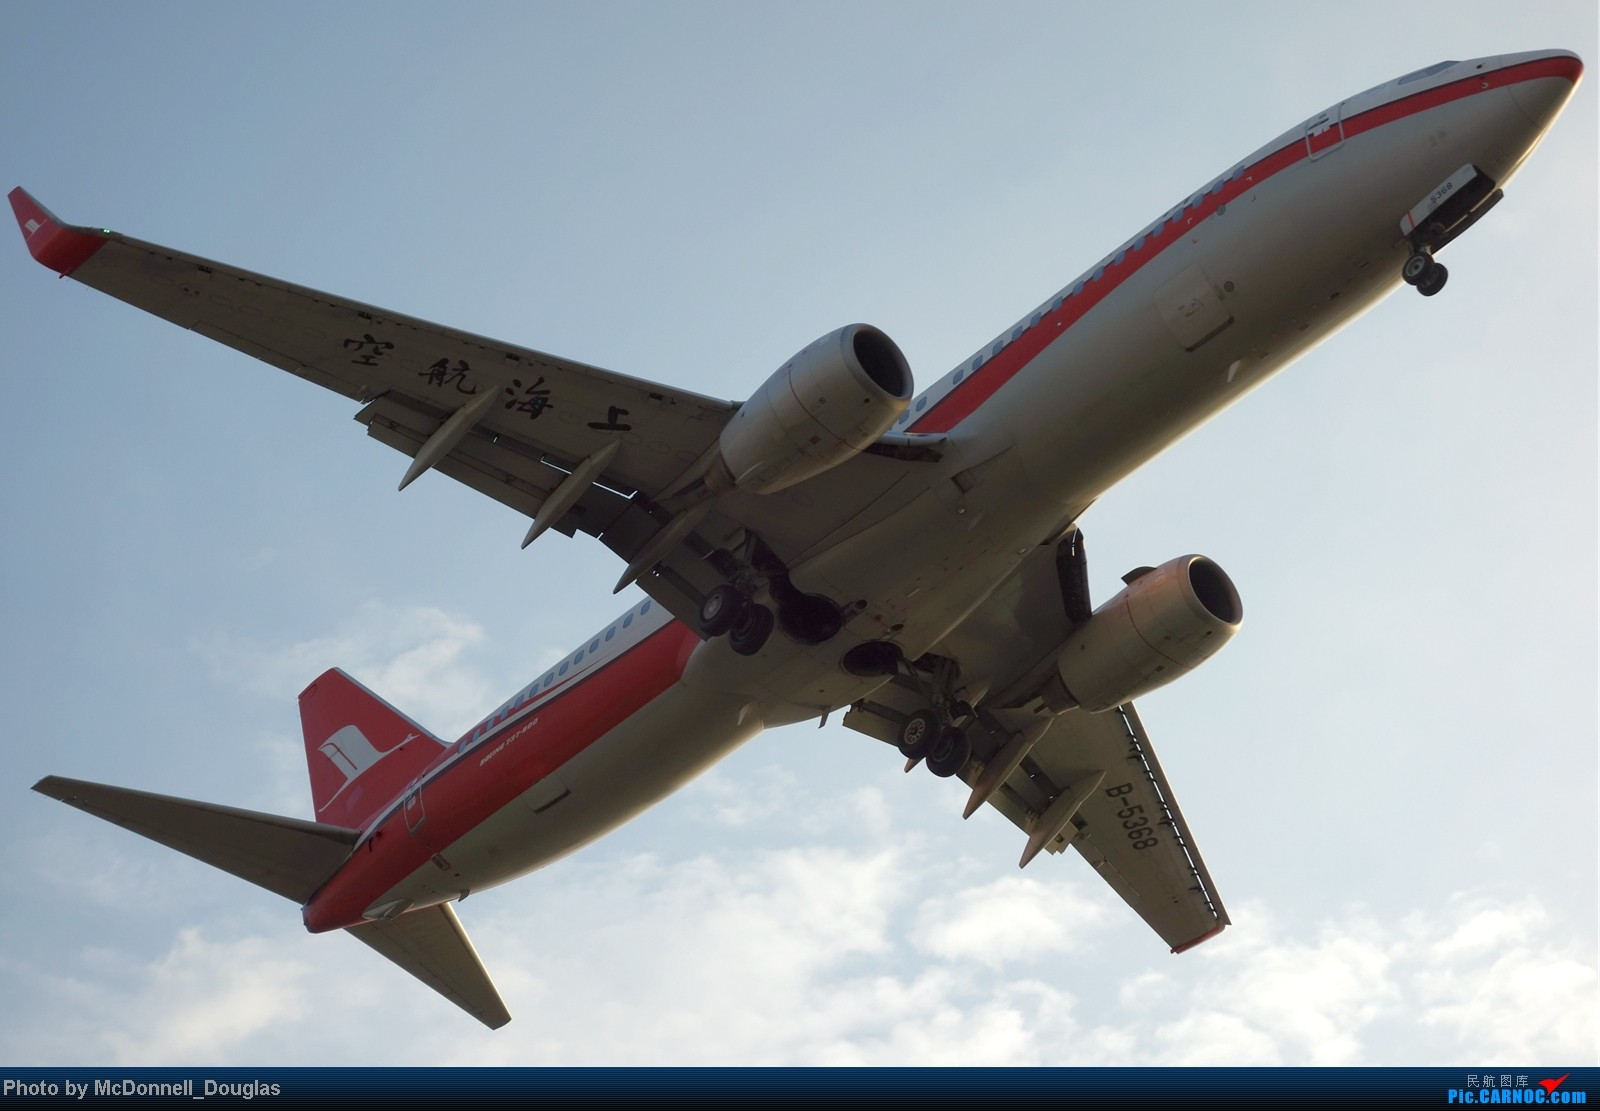 Re:[原创]【上海飞友会】ZSSS杂图一组 BOEING 737-800 B-5368 中国上海虹桥机场